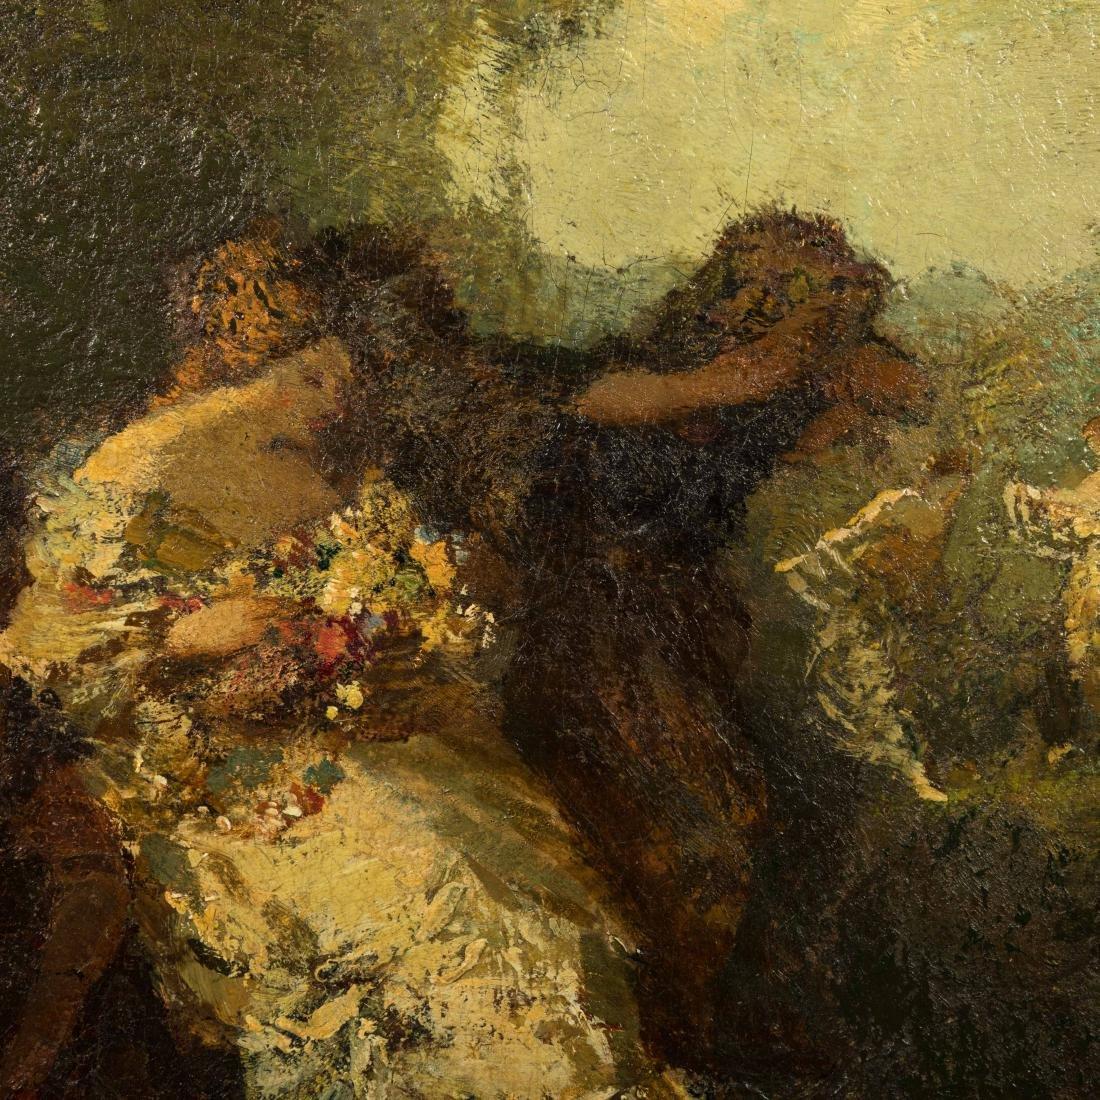 Frederick Ballard Williams - Oil on Board - 2